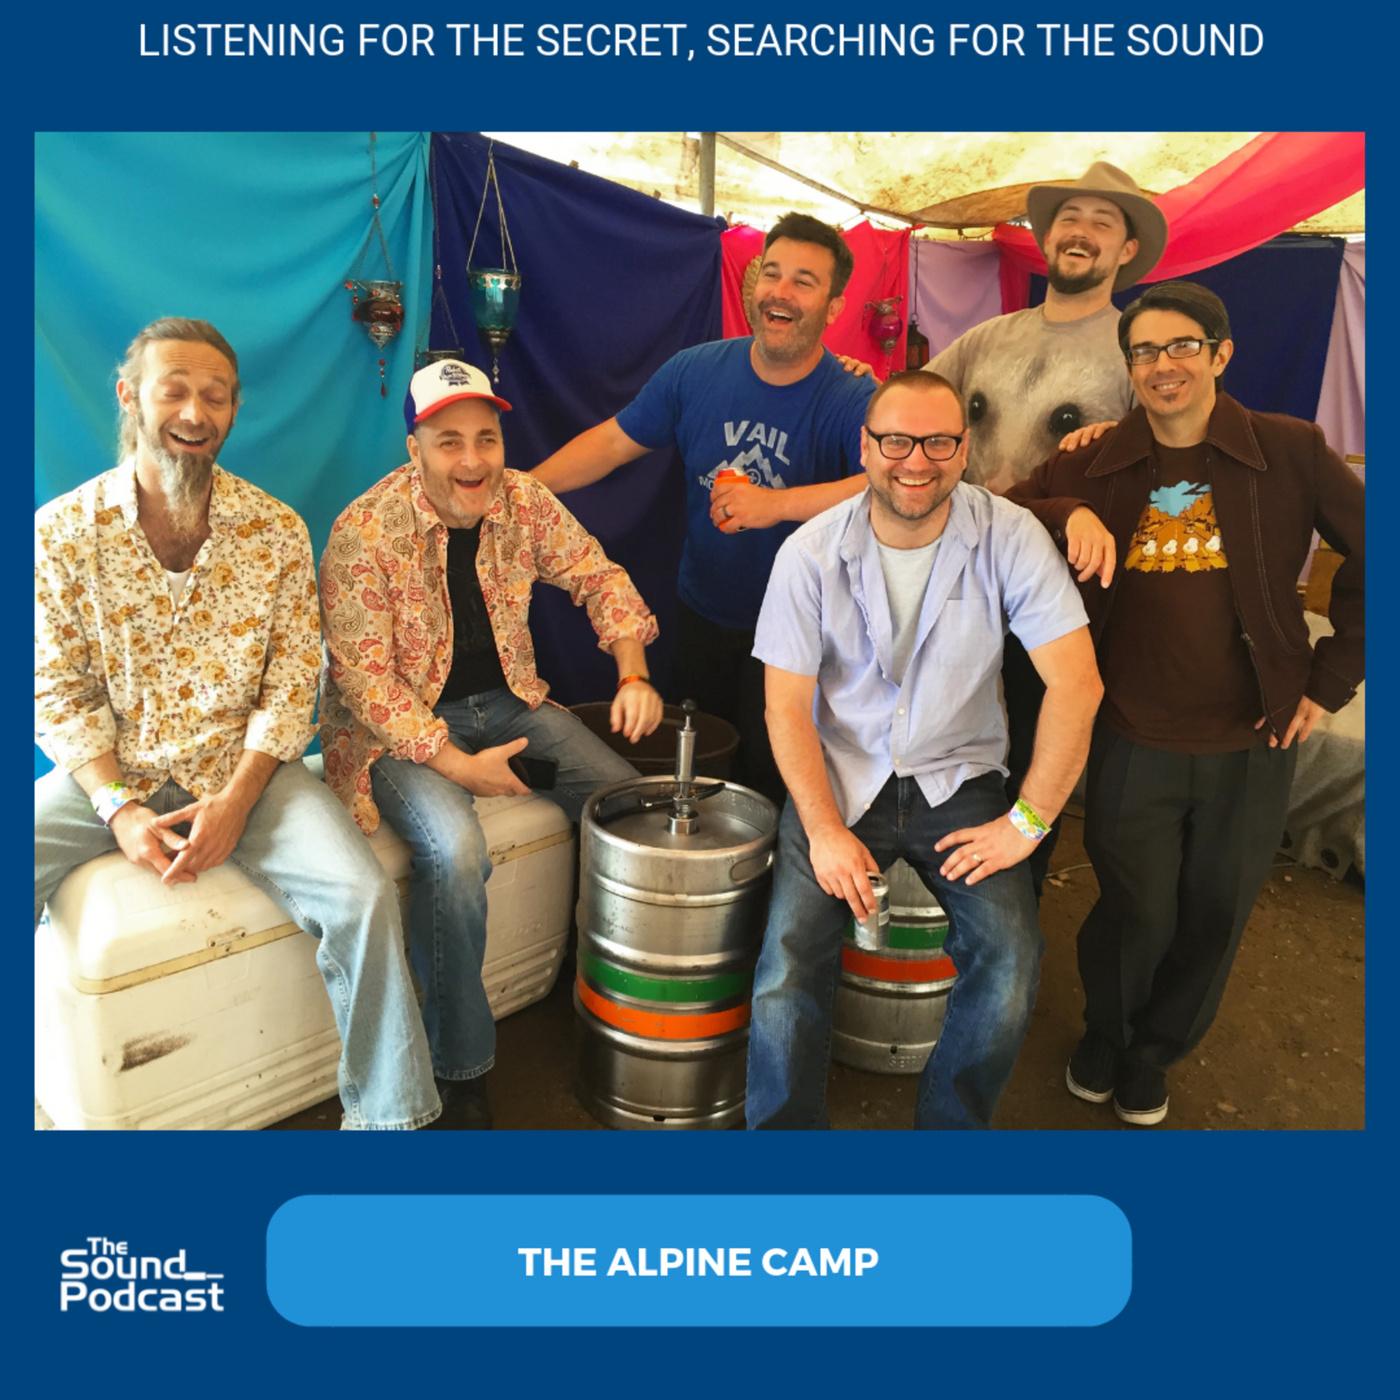 Episode 166: The Alpine Camp